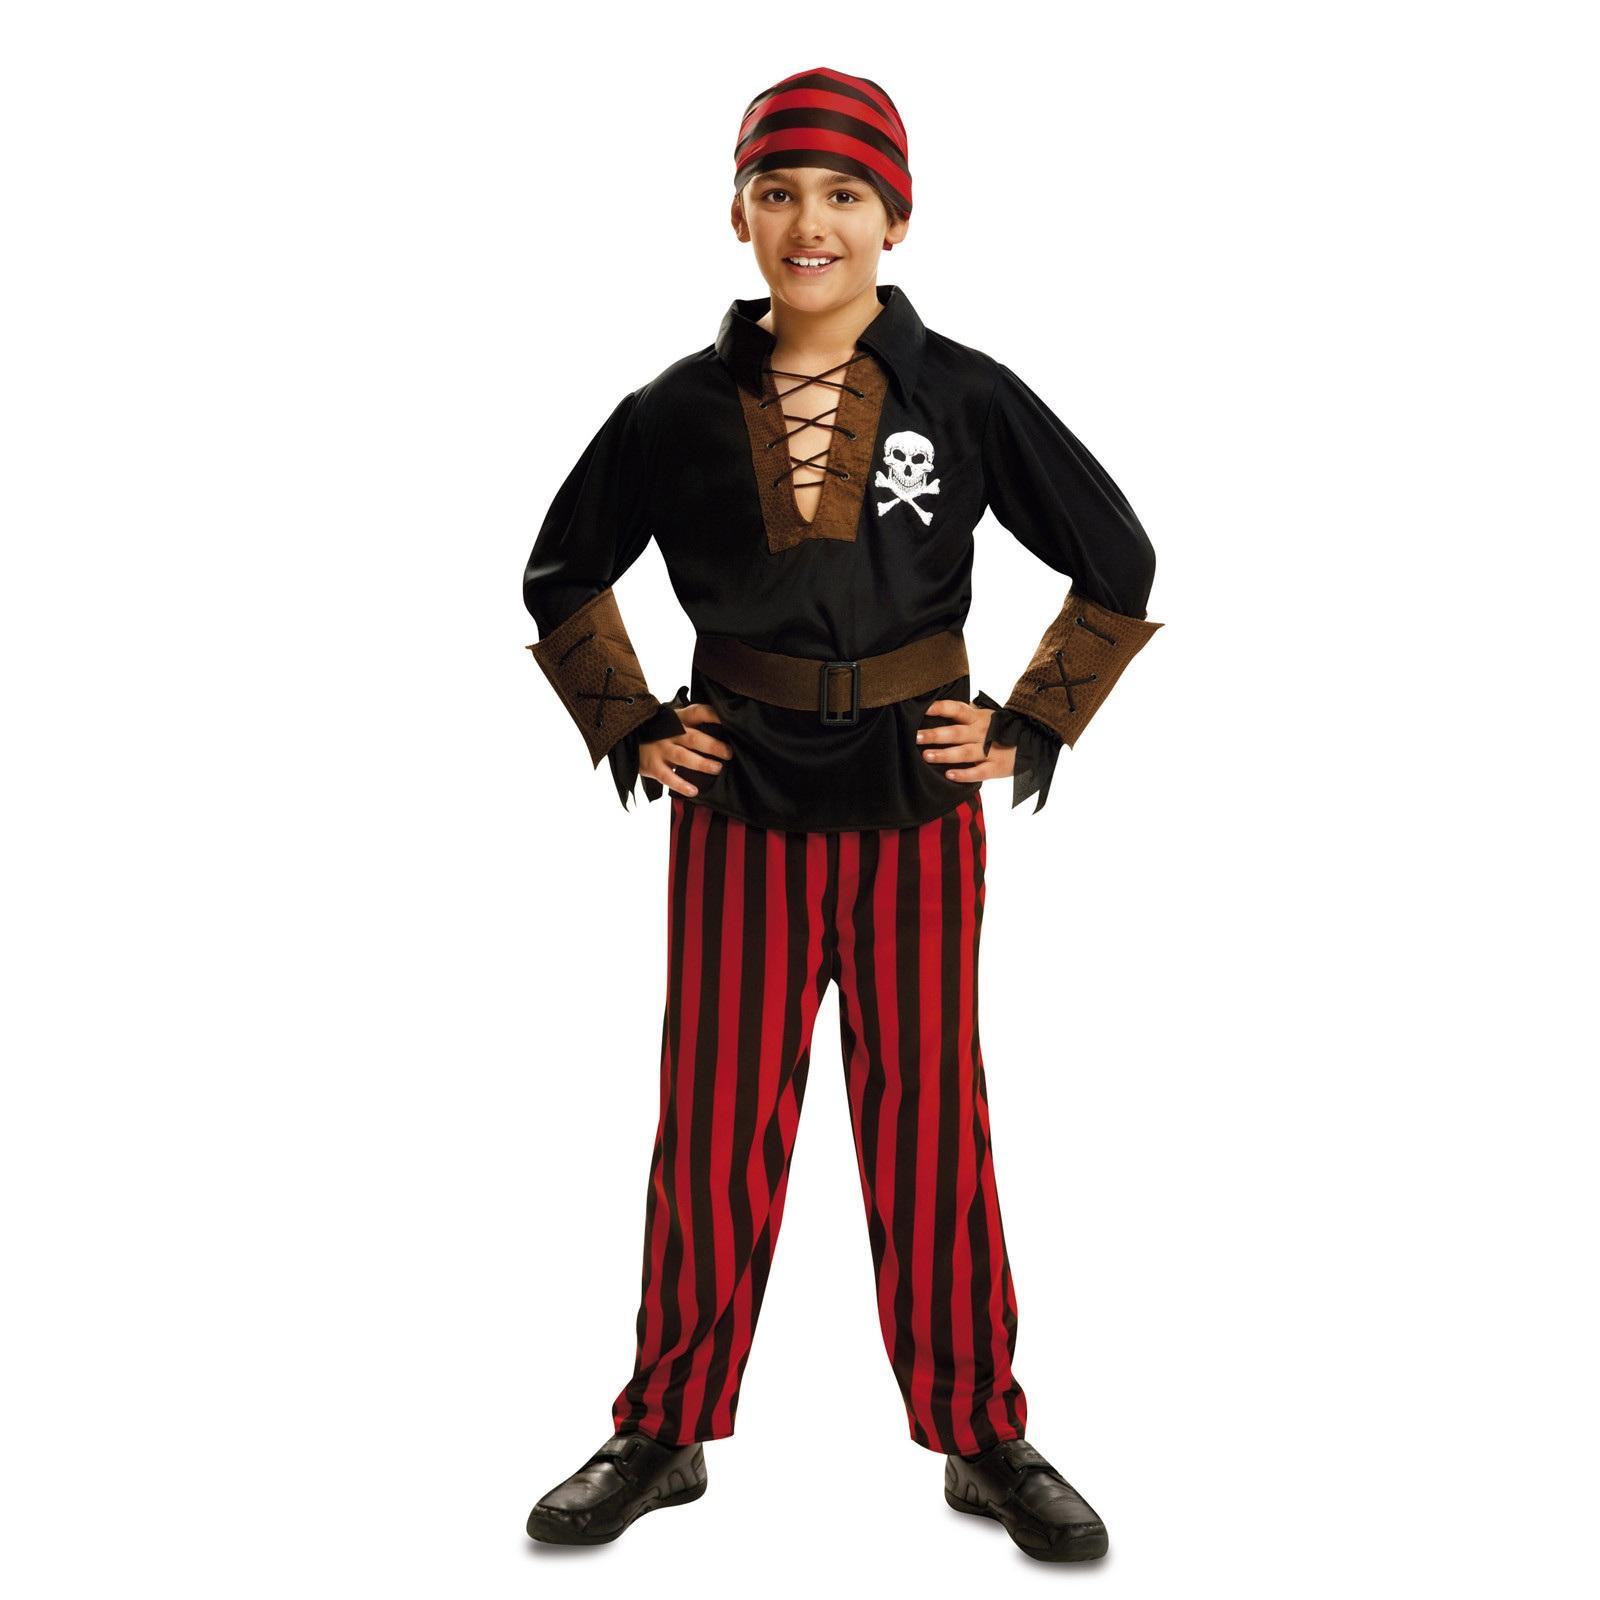 disfraz pirata bandana bebé niño 200587mom - DISFRAZ DE PIRATA BANDANA BEBE NIÑO